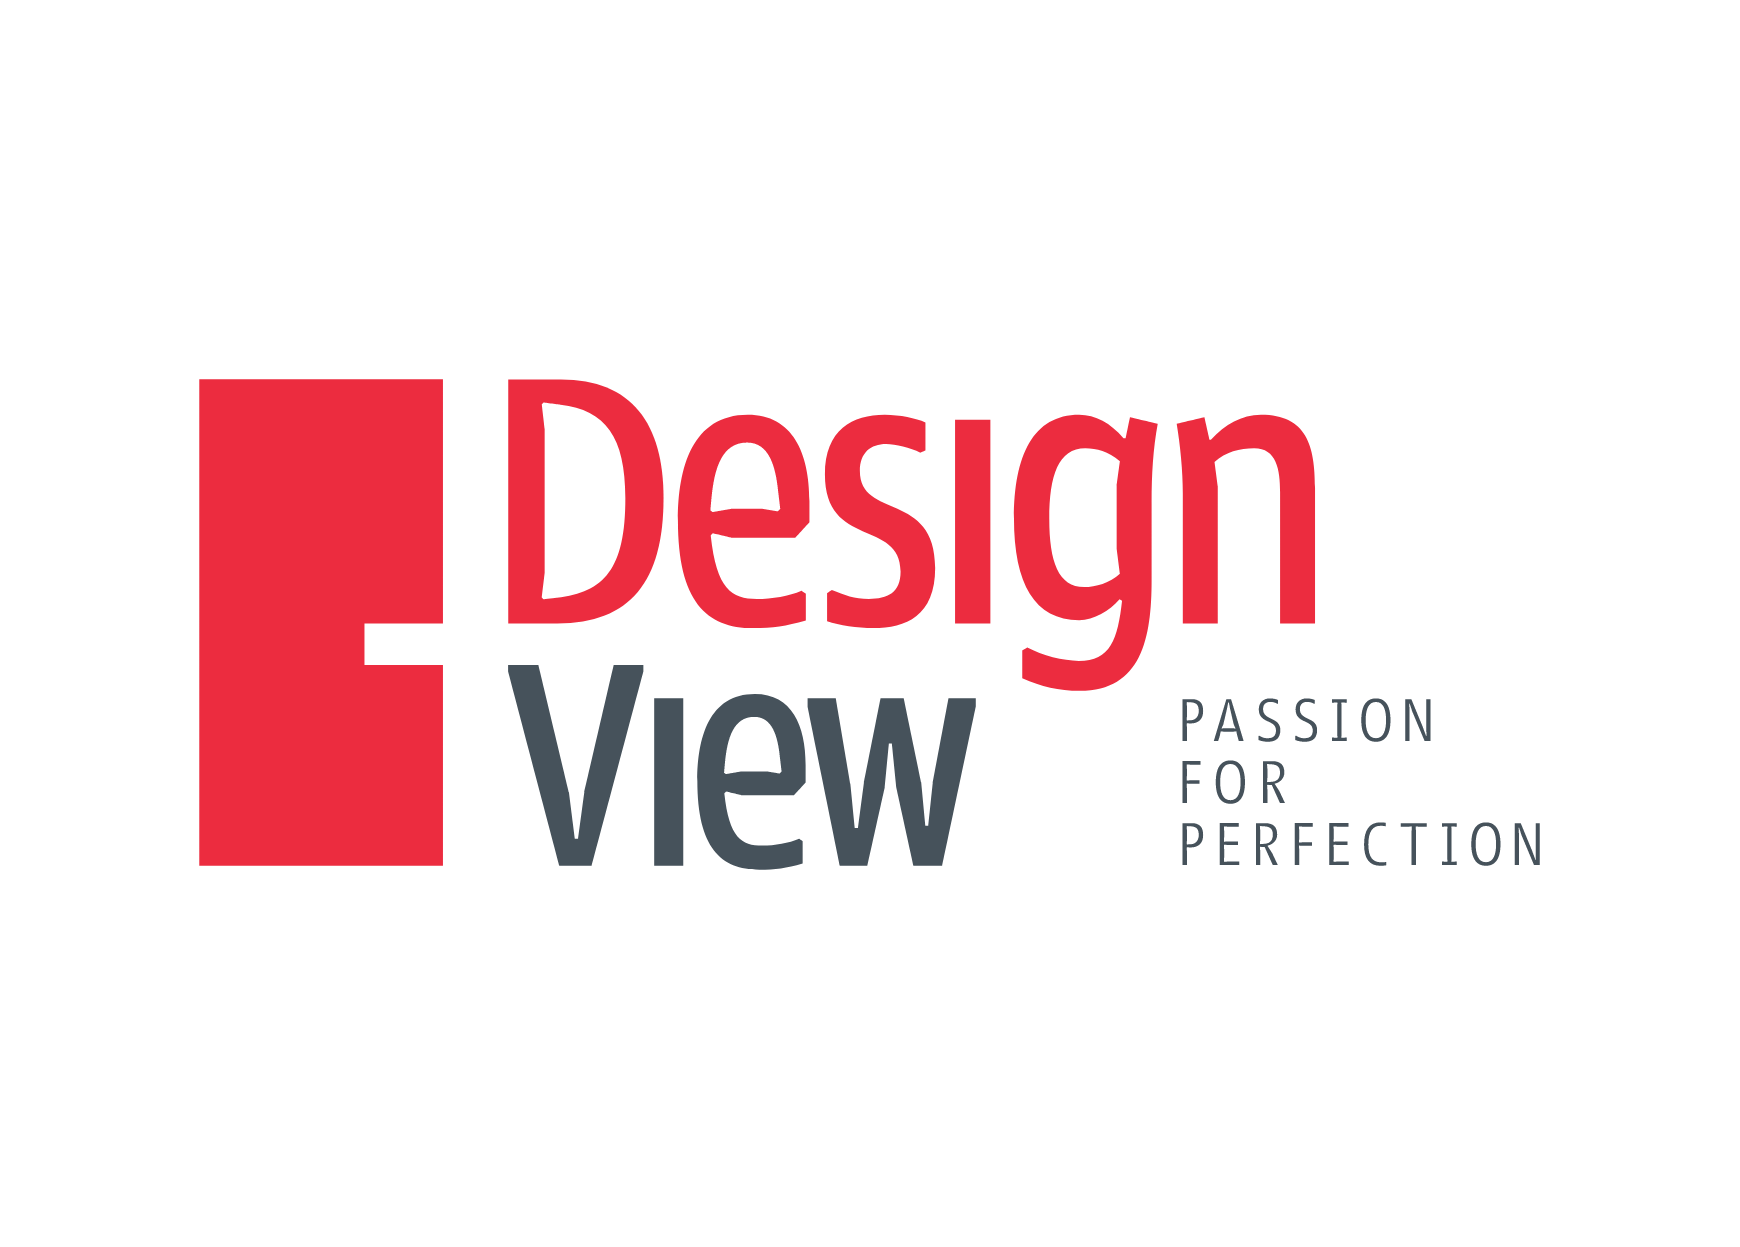 Designview.cz